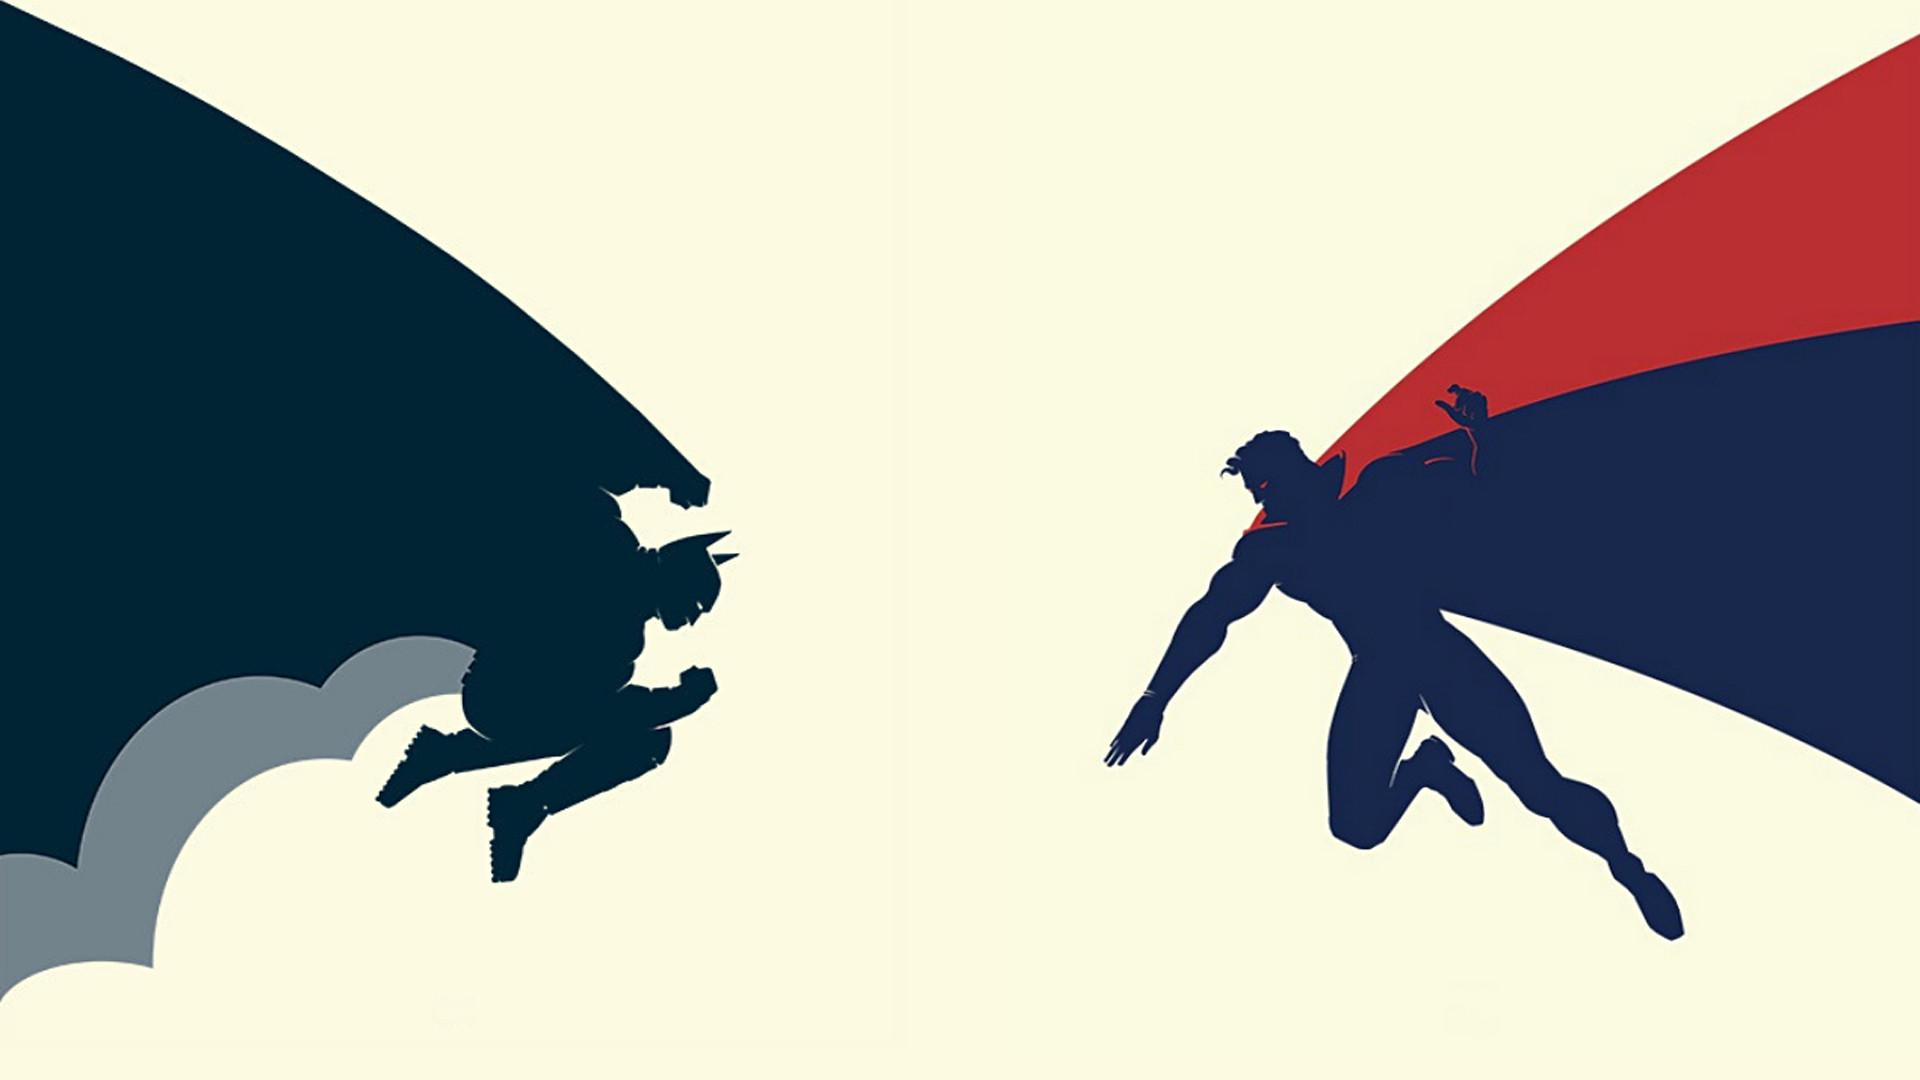 Batman Minimalist Wallpaper 72 Images